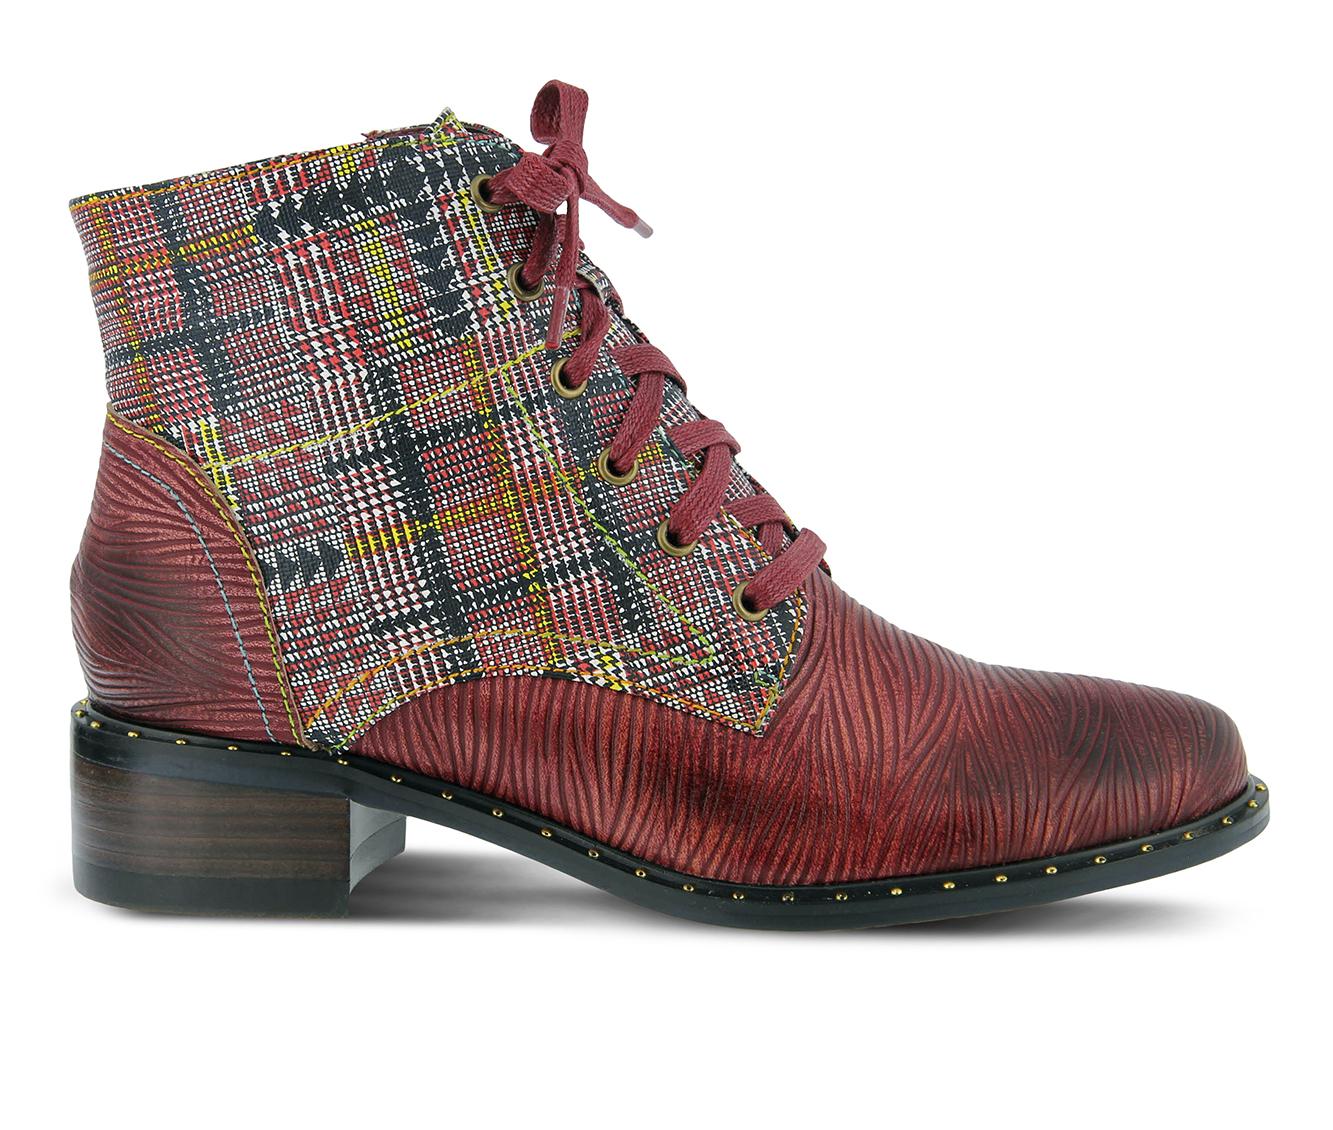 L'Artiste Mazoya Women's Boots (Red Leather)